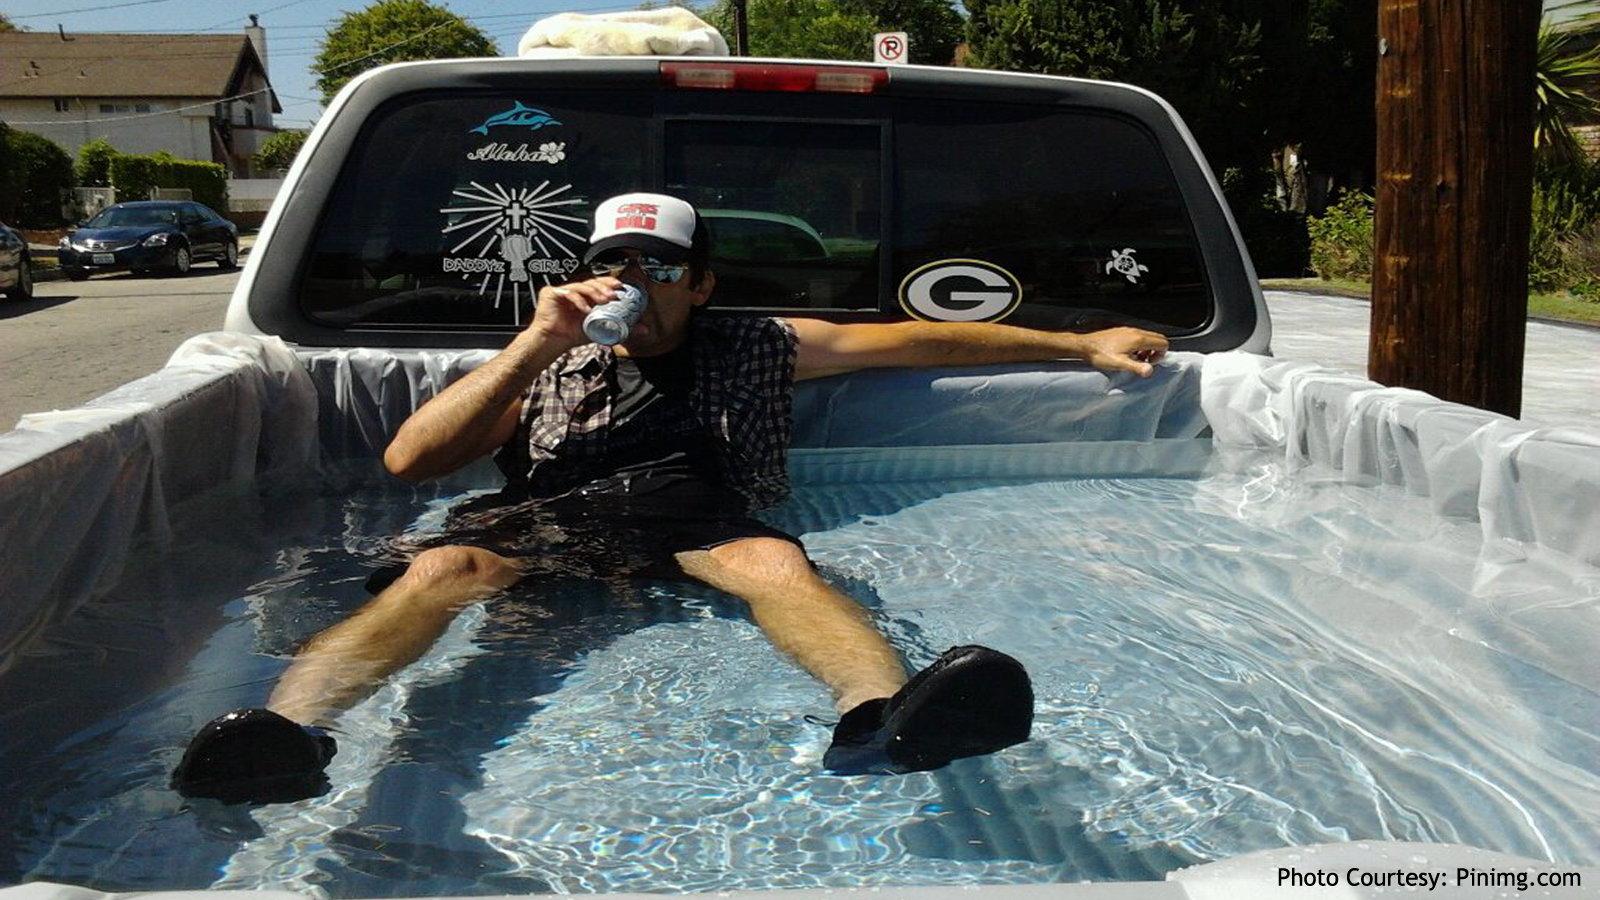 Pool on Wheels